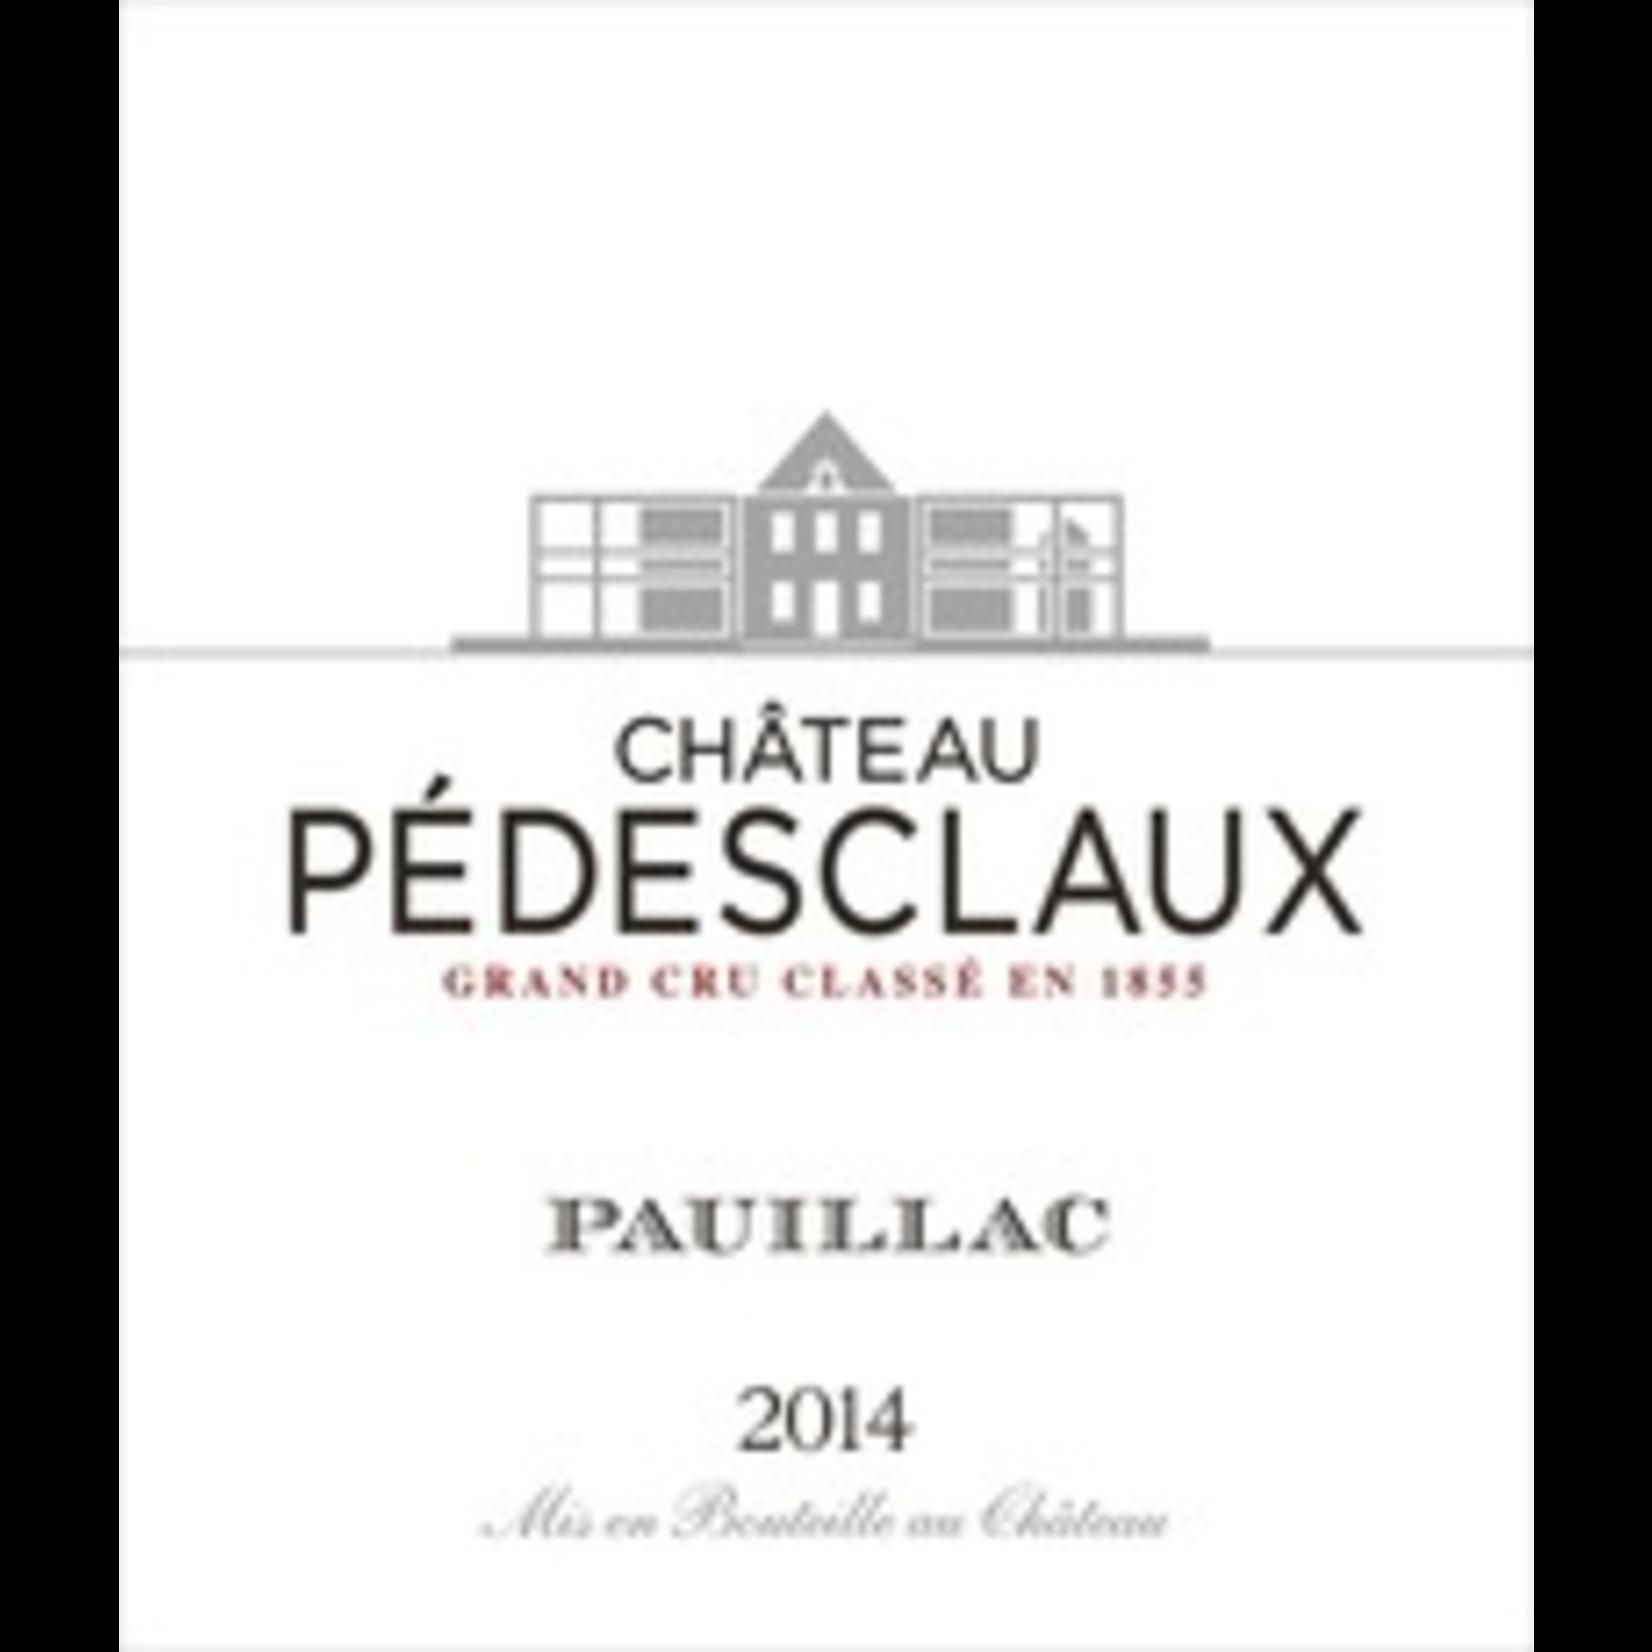 Wine Chateau Pedesclaux 2014